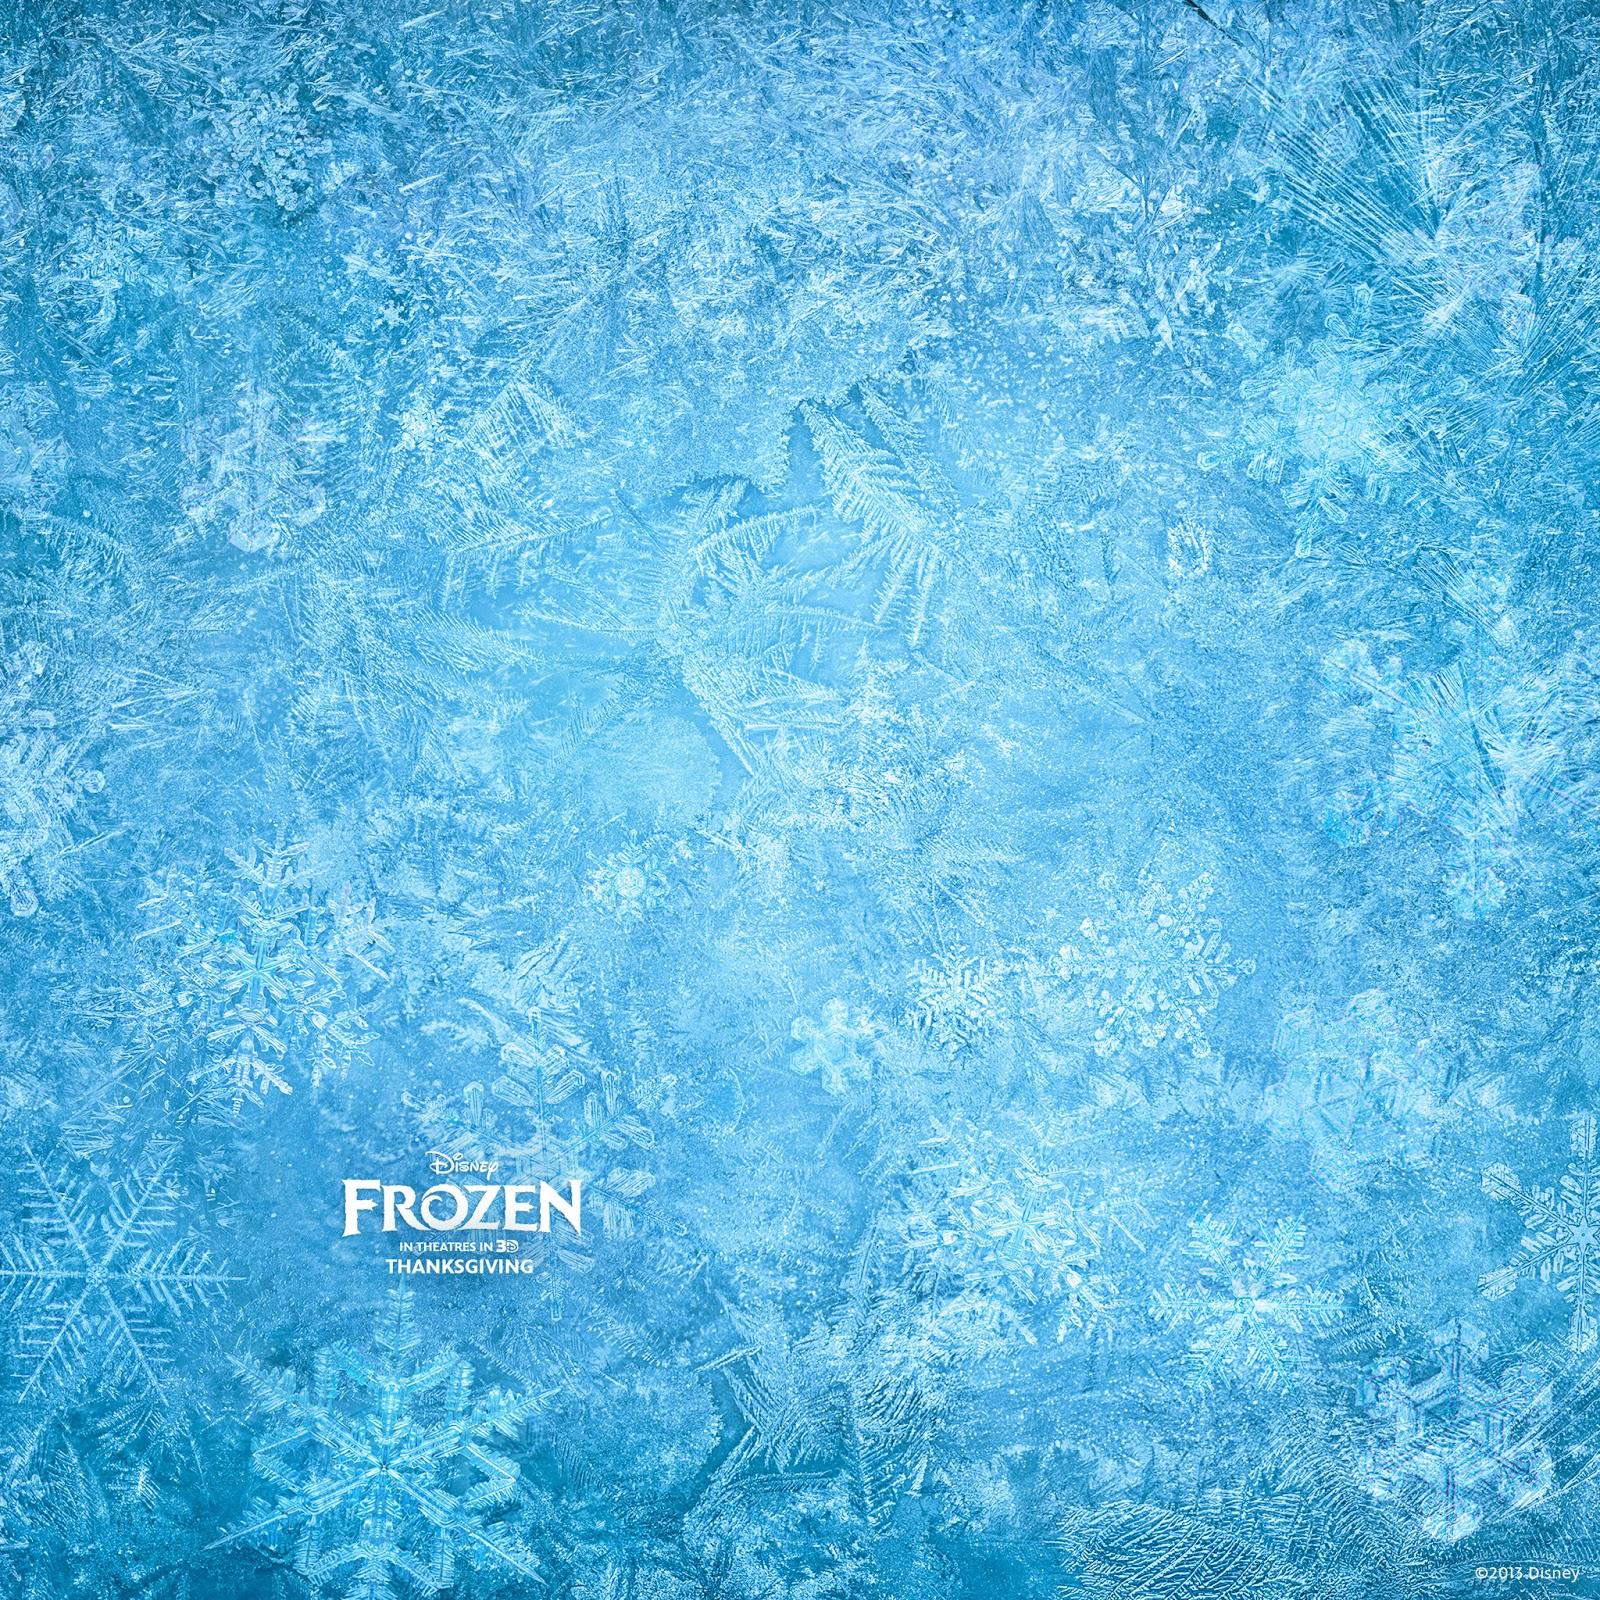 Disney Frozen Wallpaper For Tablets Wallpapersafari